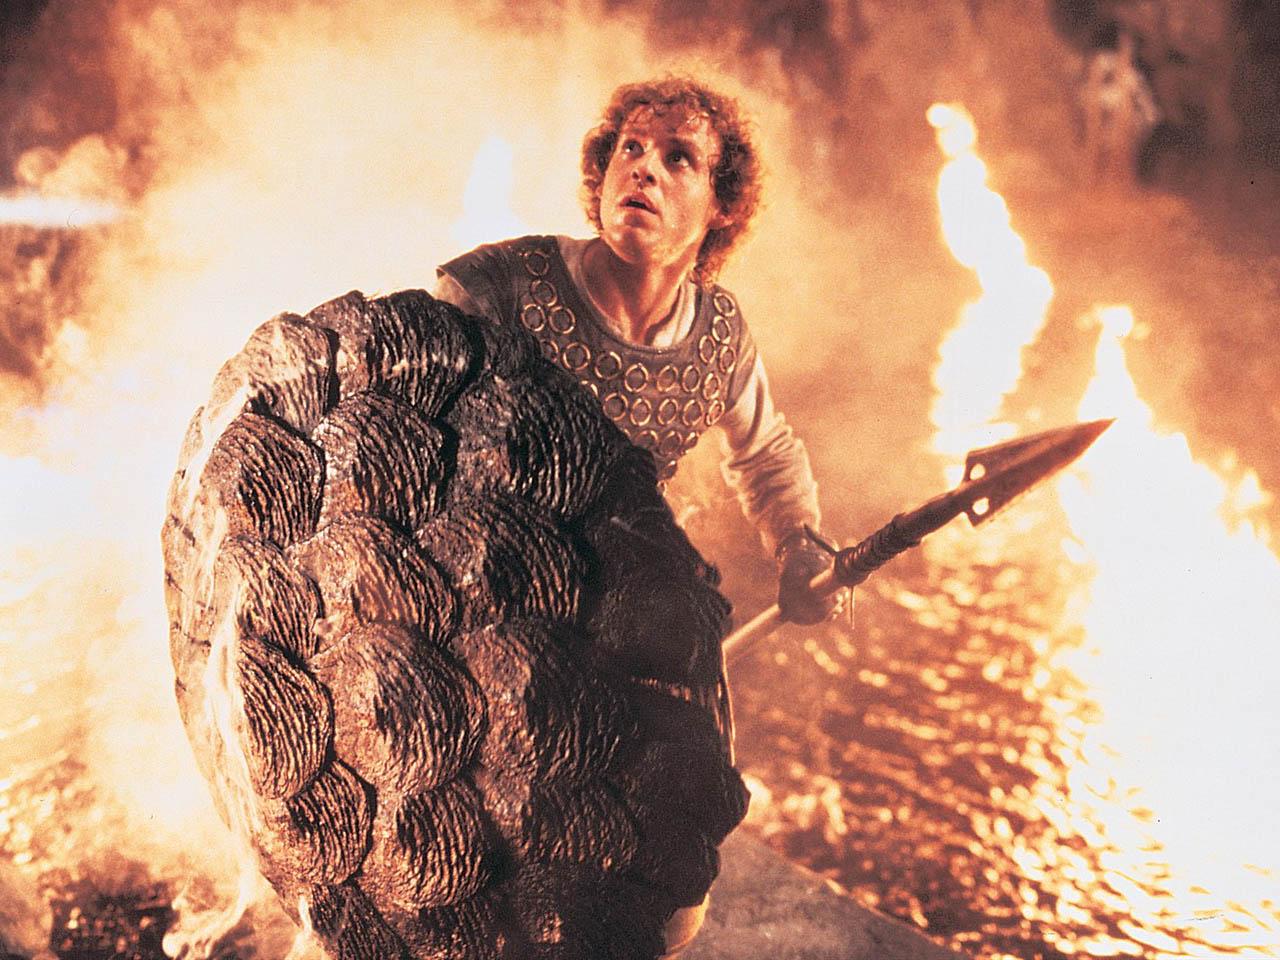 1981 Movie Project - Dragonslayer - 01